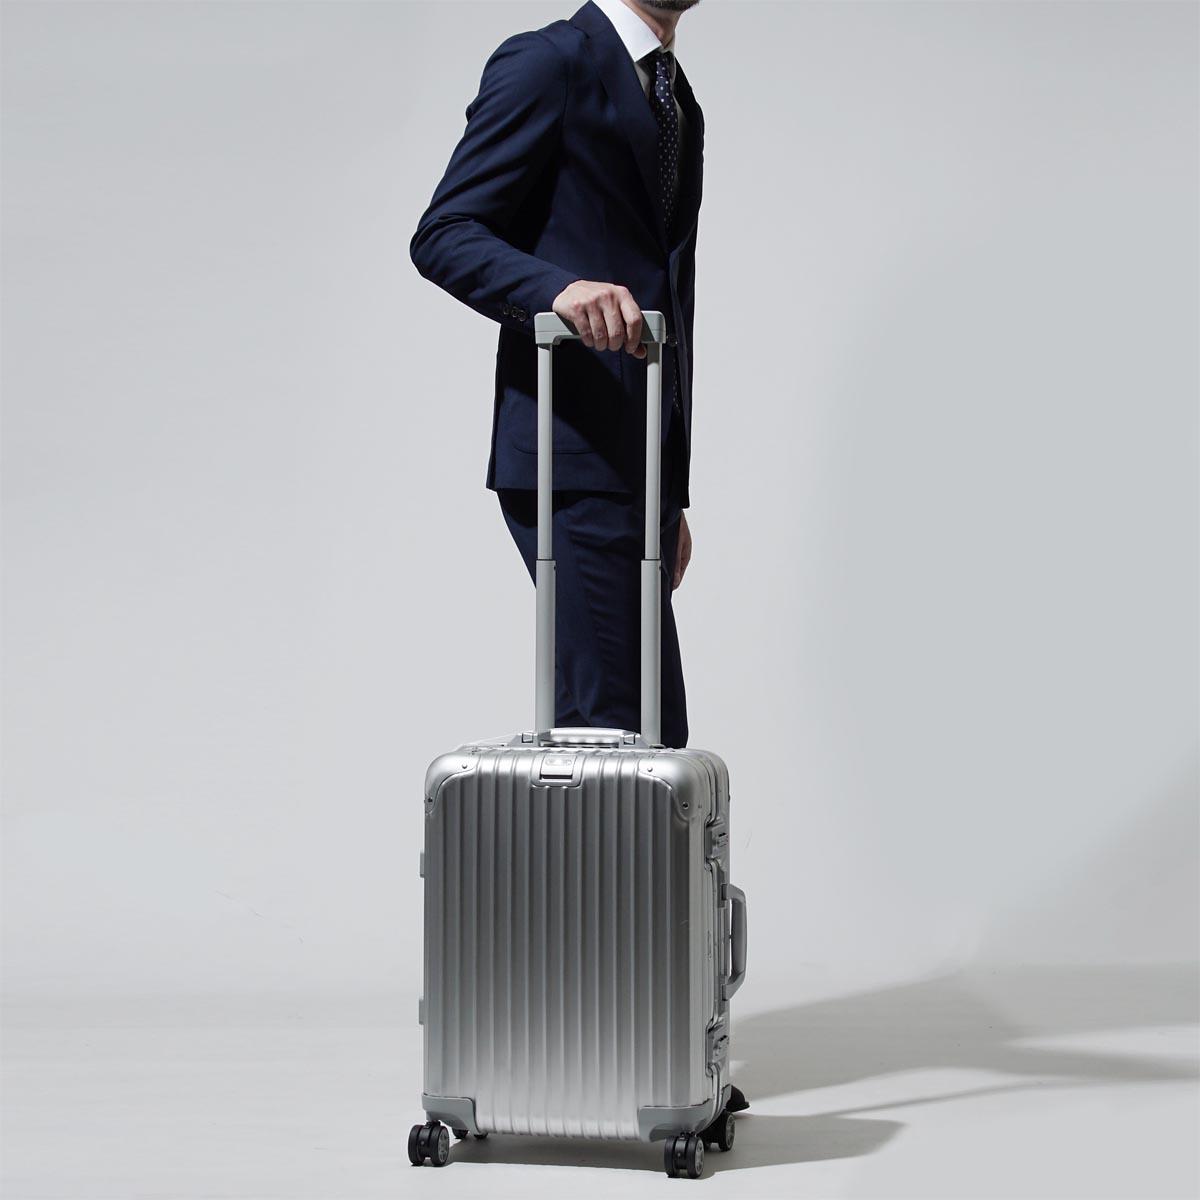 leisure p sl adults household silver en goods rimowa hktv luggage main cabin s multiwheel cabins topas travel electronics paperplane